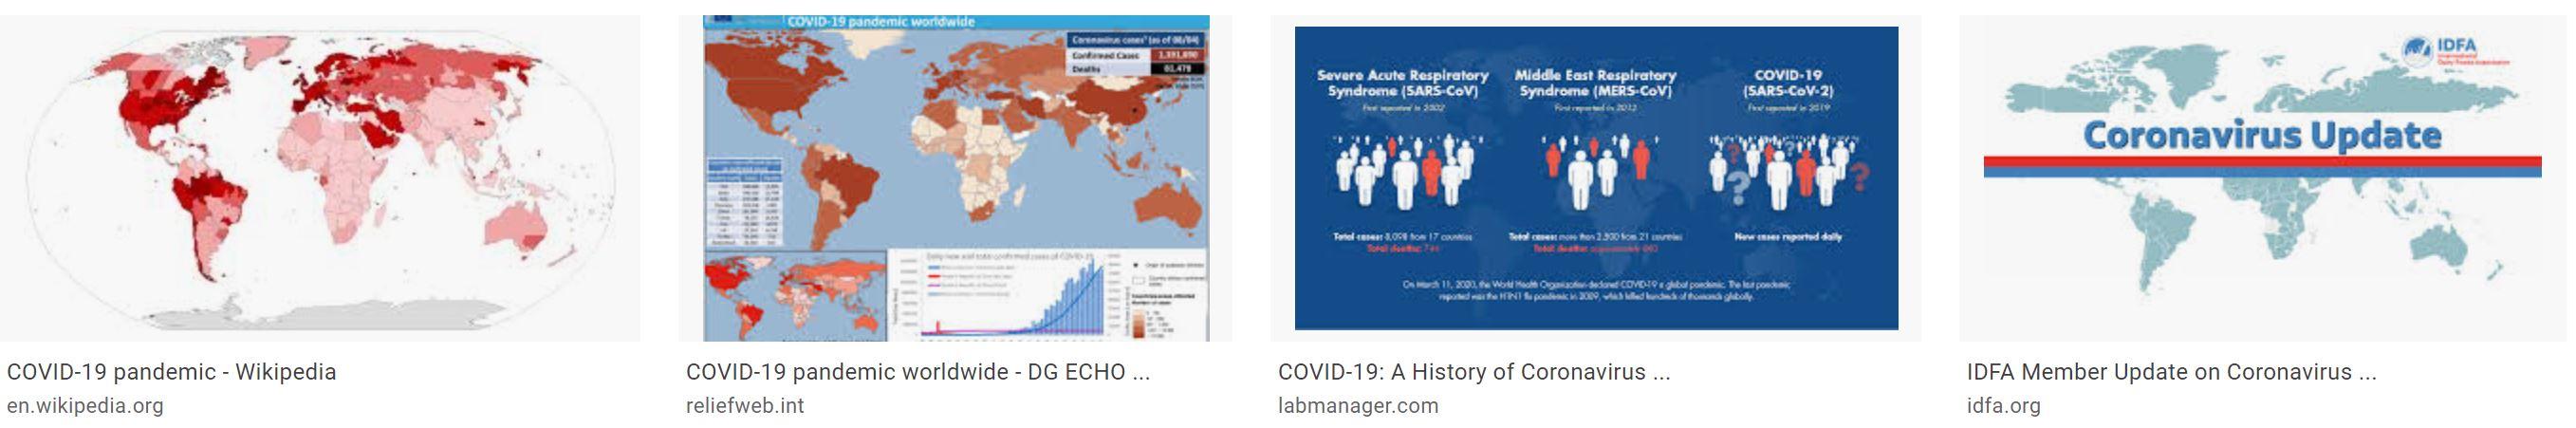 Google images world-covid2